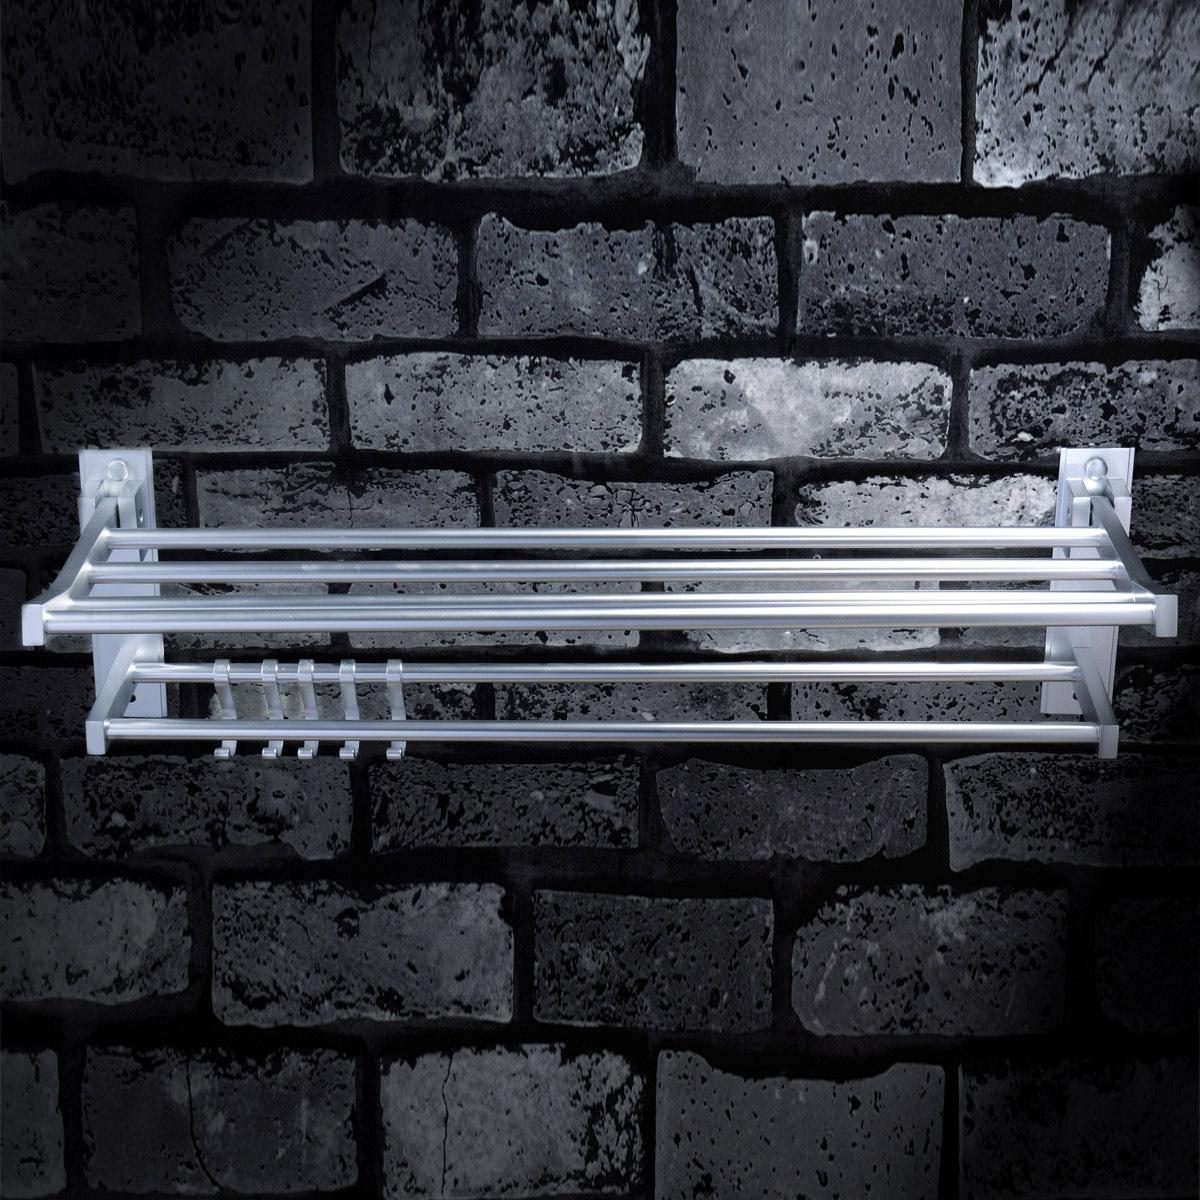 Solid bathroom shelf towel rack space aluminum bathroom hardware accessories set towel rack(China (Mainland))